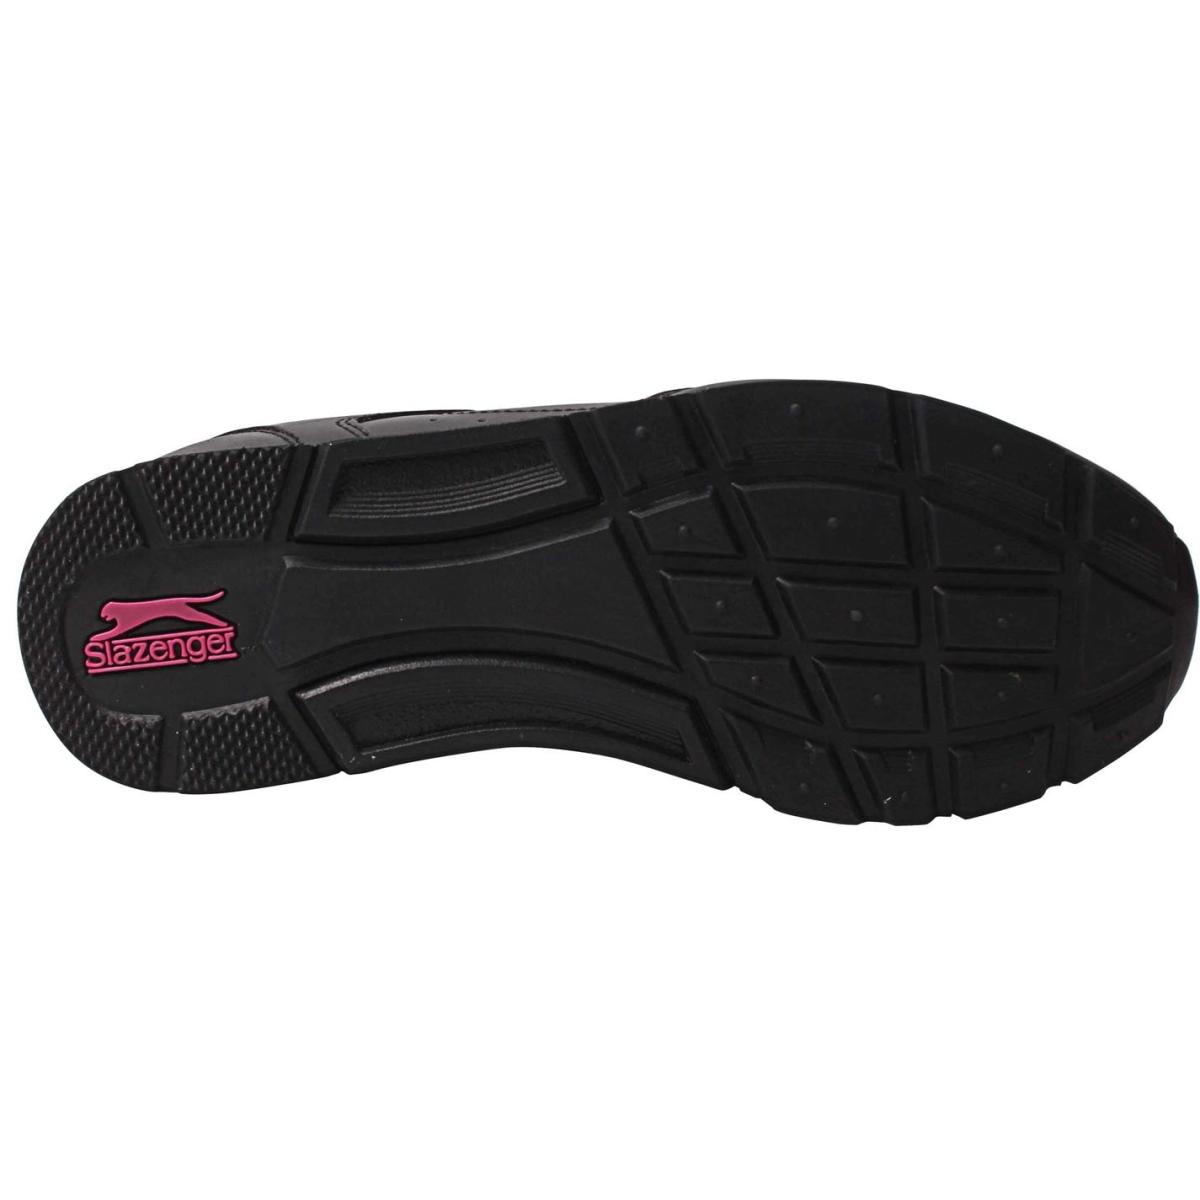 Slazenger-Classic-Turnschuhe-Laufschuhe-Damen-Sportschuhe-Sneaker-1265 Indexbild 8